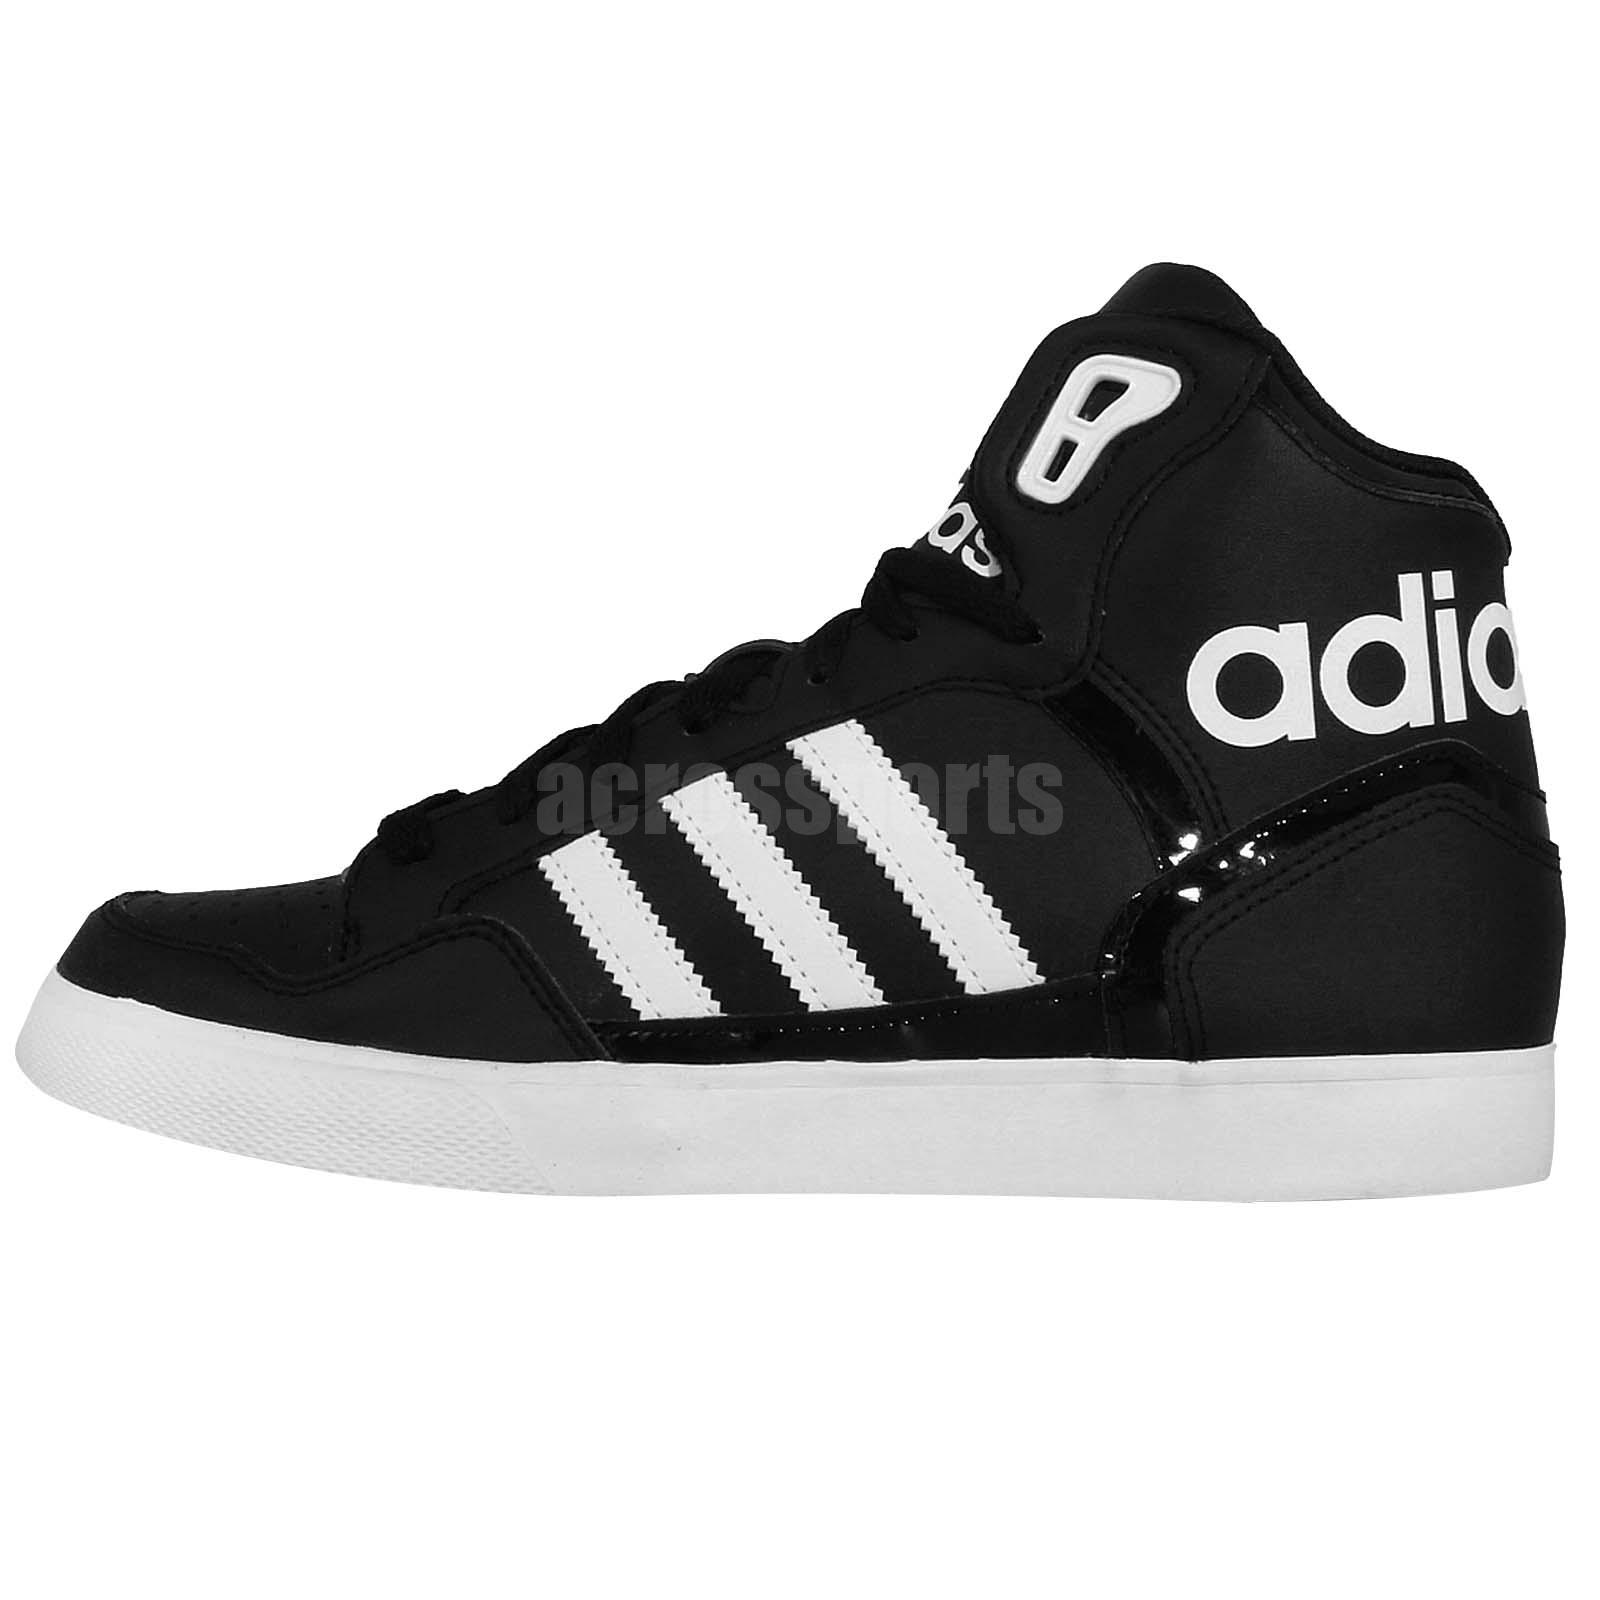 adidas originals extaball w black white 2014 womens casual shoes sneakers ebay. Black Bedroom Furniture Sets. Home Design Ideas